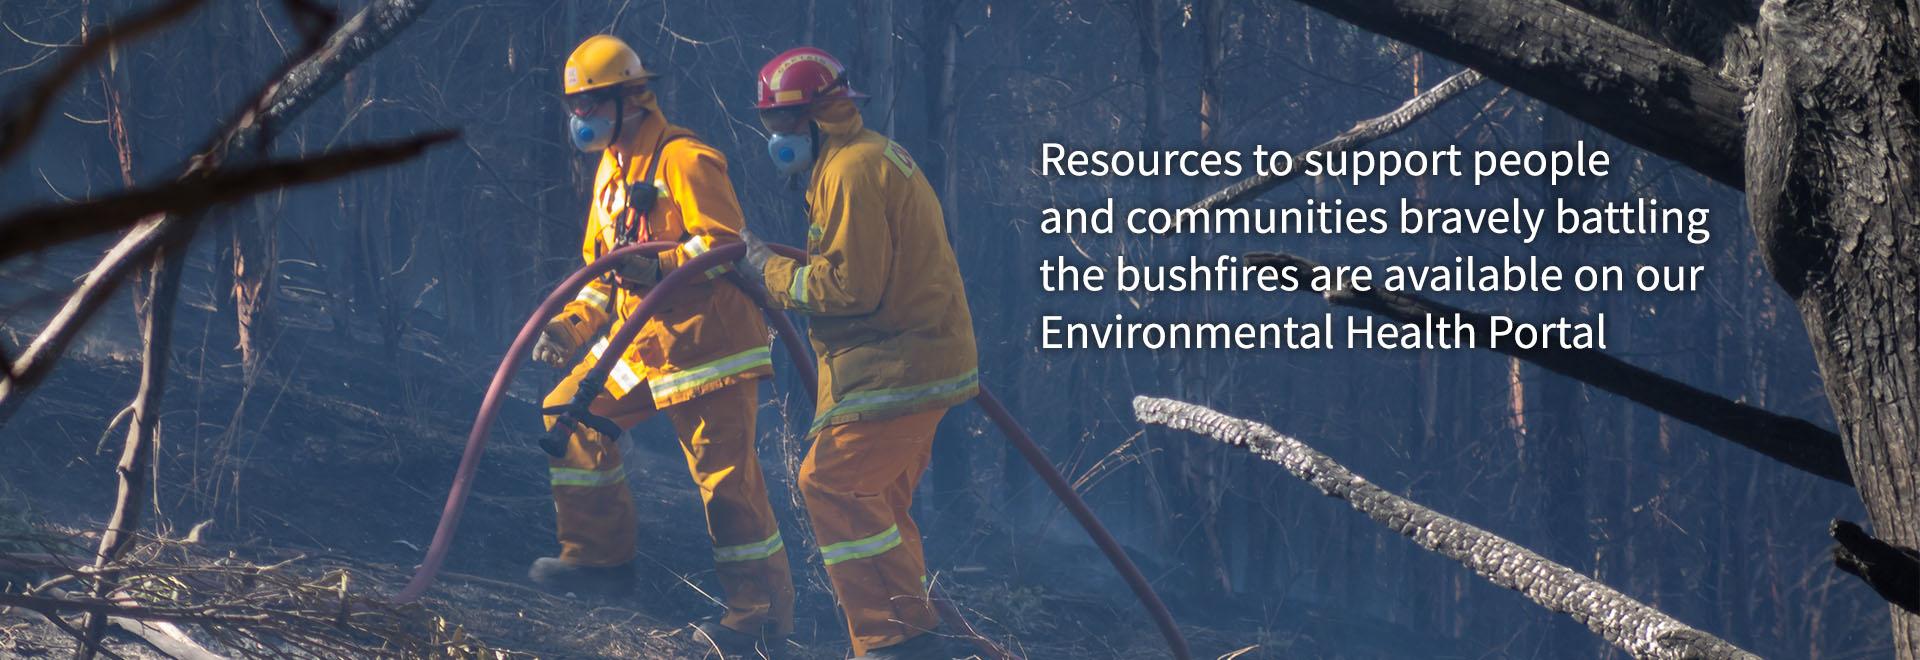 Bushfire resources